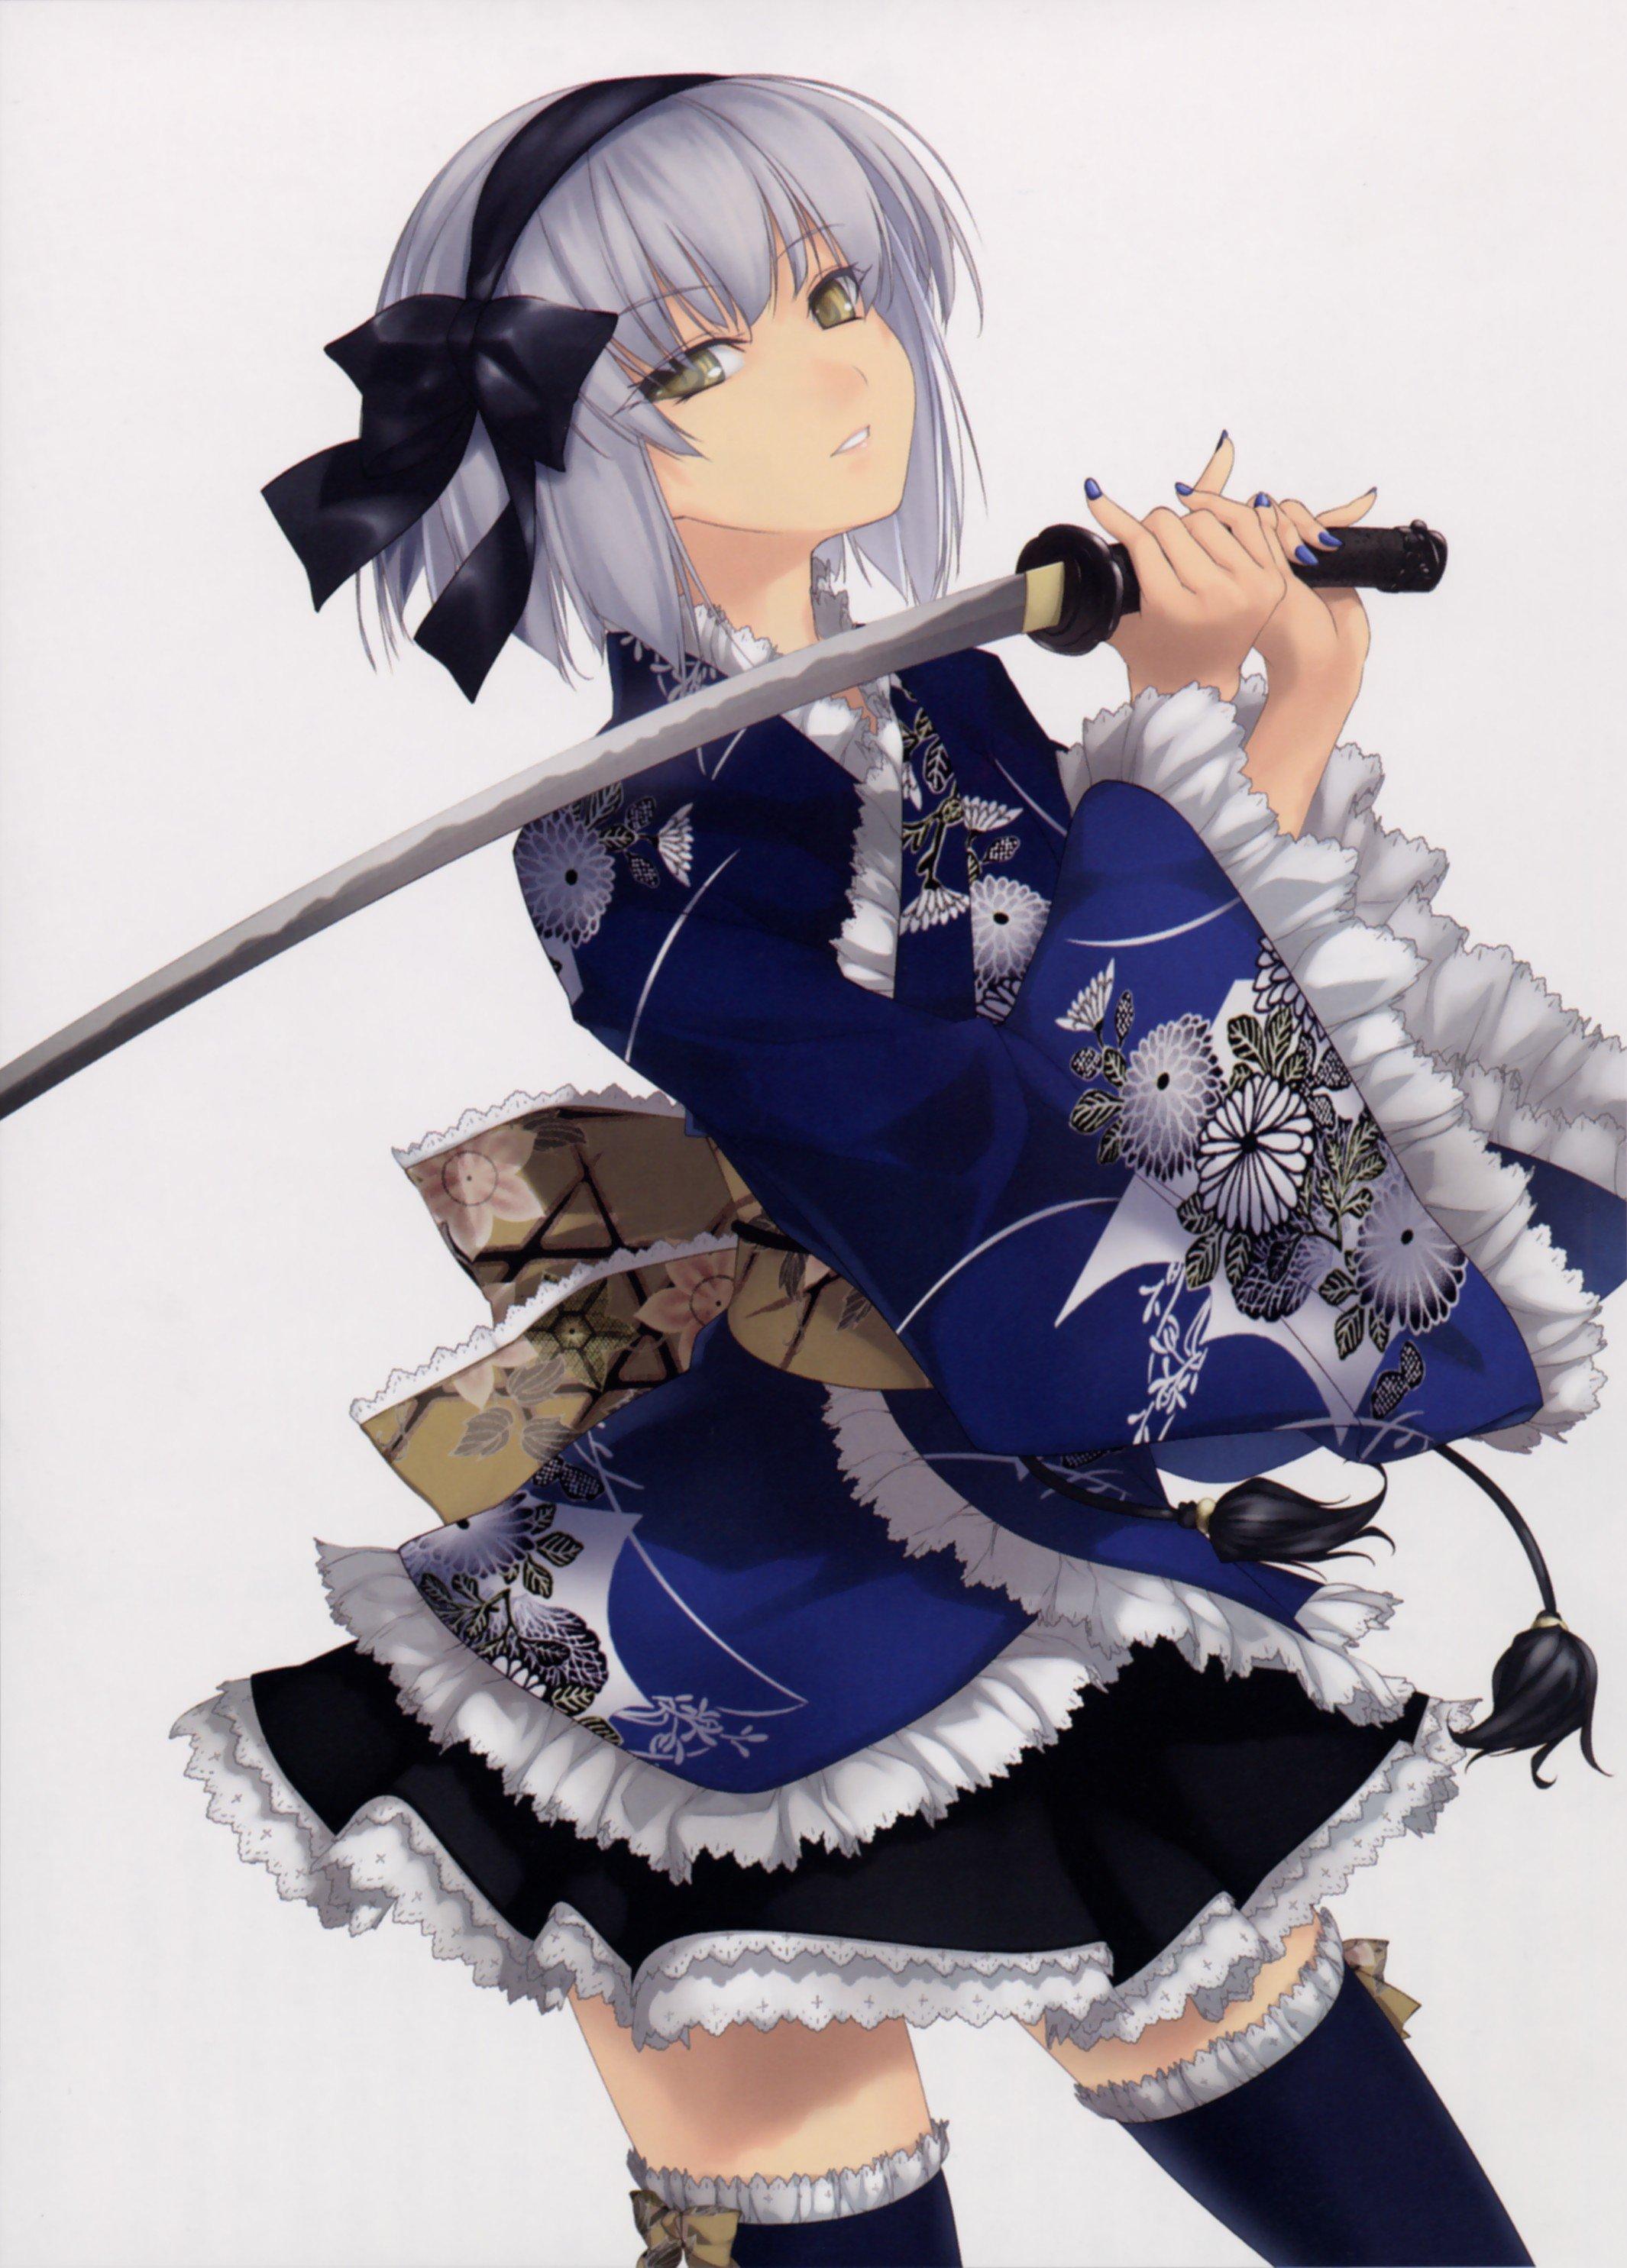 White Hair Anime Pirate Girl